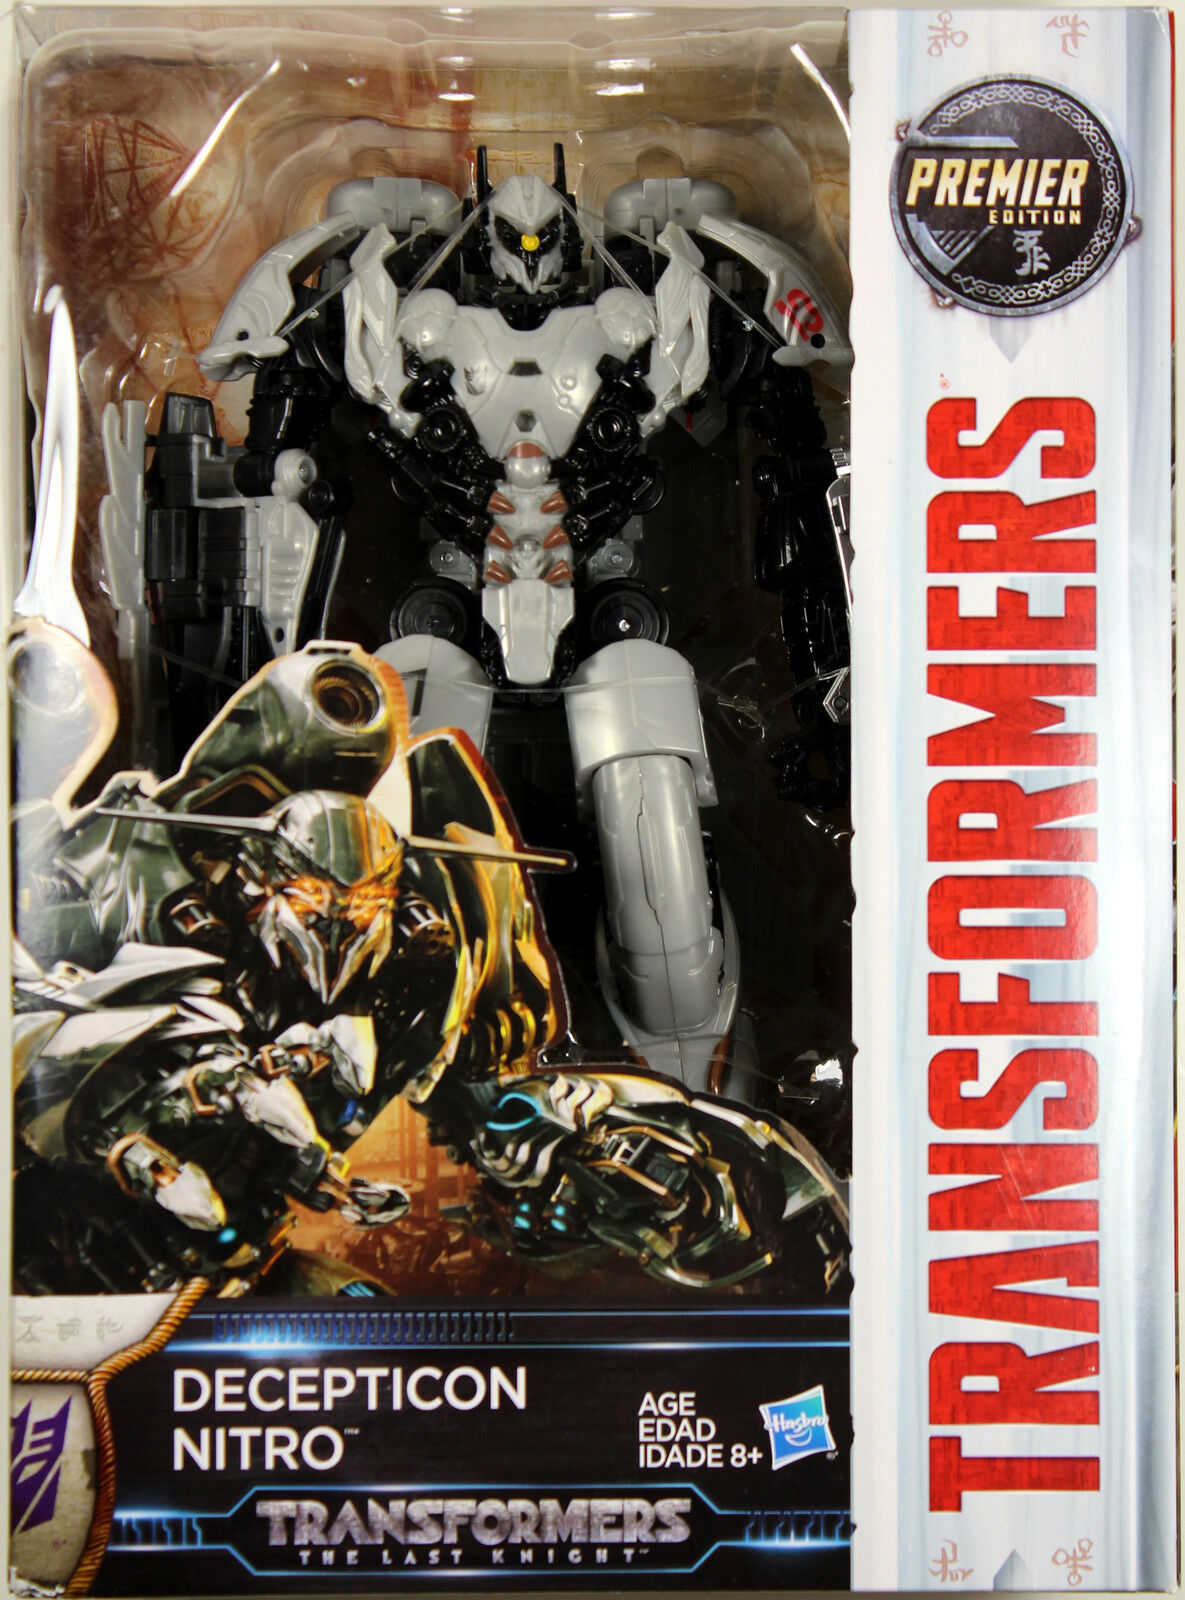 Transformers  Last Knight  Decepticon NITRO ACTION FIGURE  Voyager Class